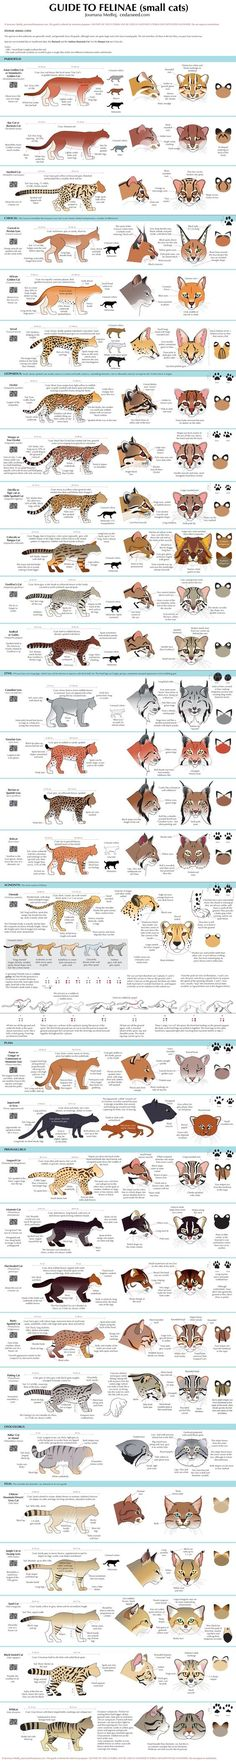 Guide to Little Cats - by Majnouna, via deviantART   ...Small BIG Cats...: